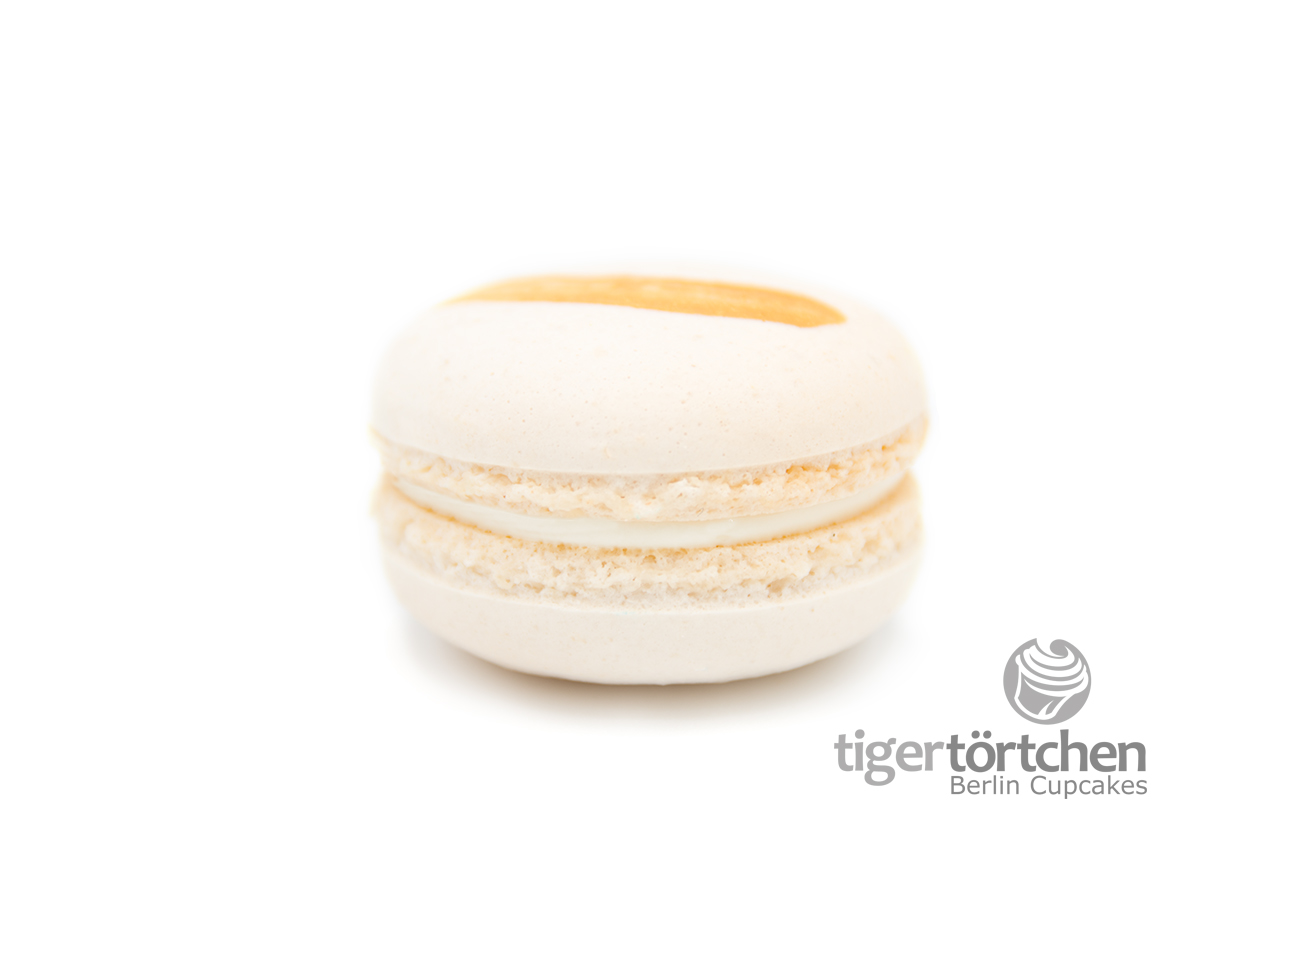 Macaron Champagne-Deluxe Berlin tigertörtchen